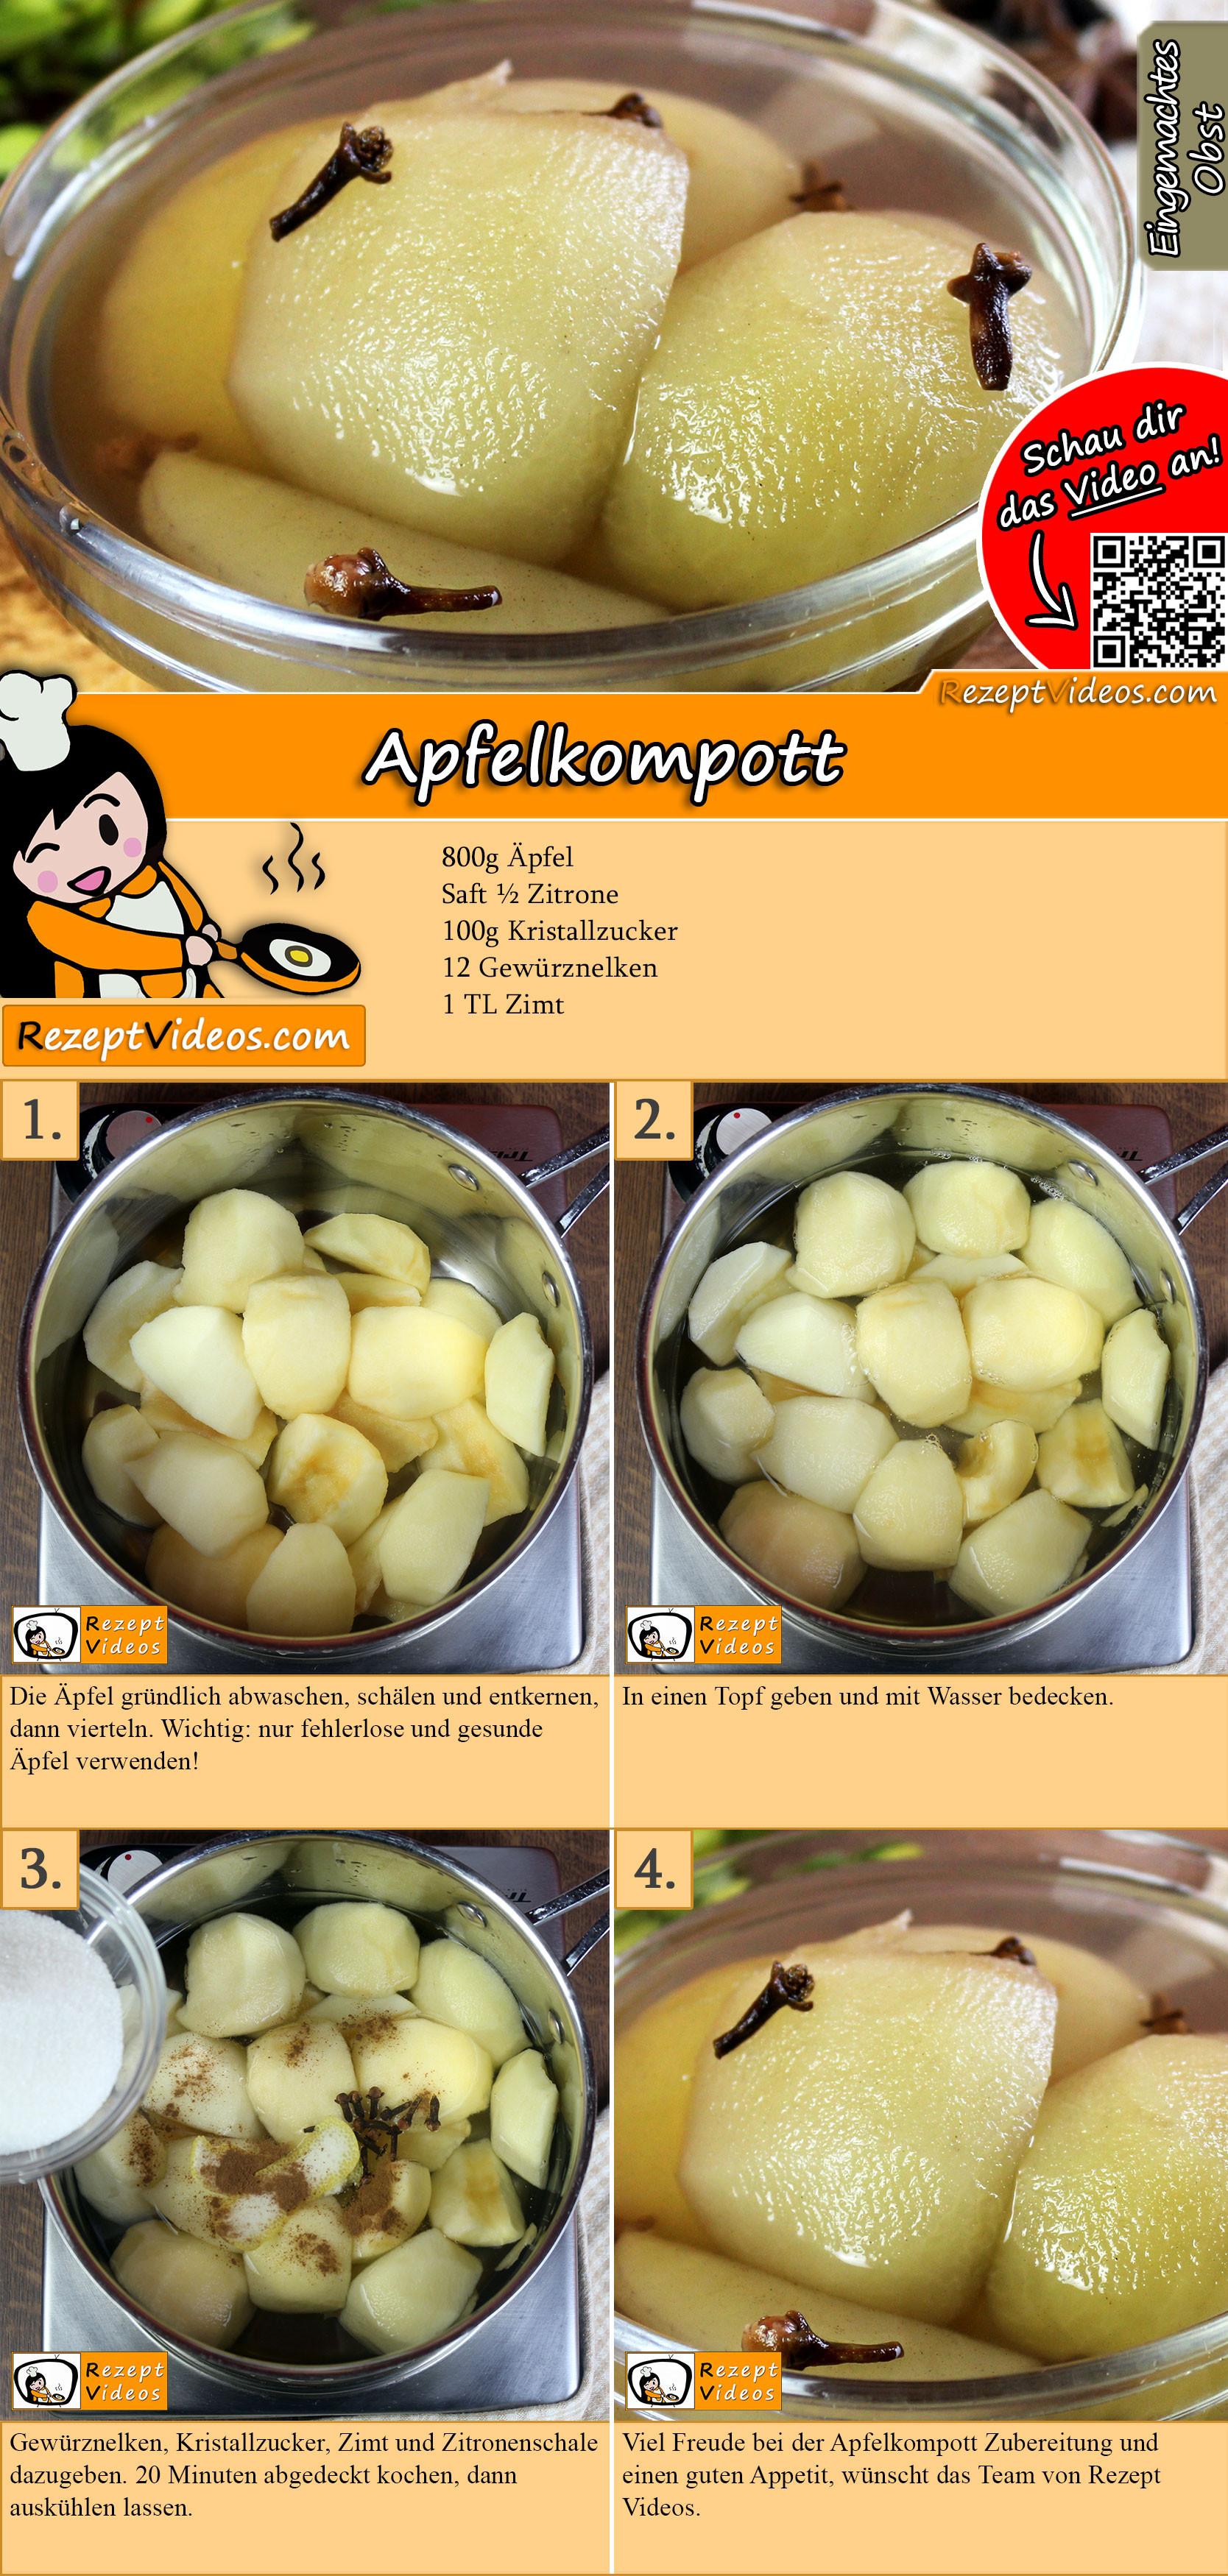 Apfelkompott Rezept mit Video